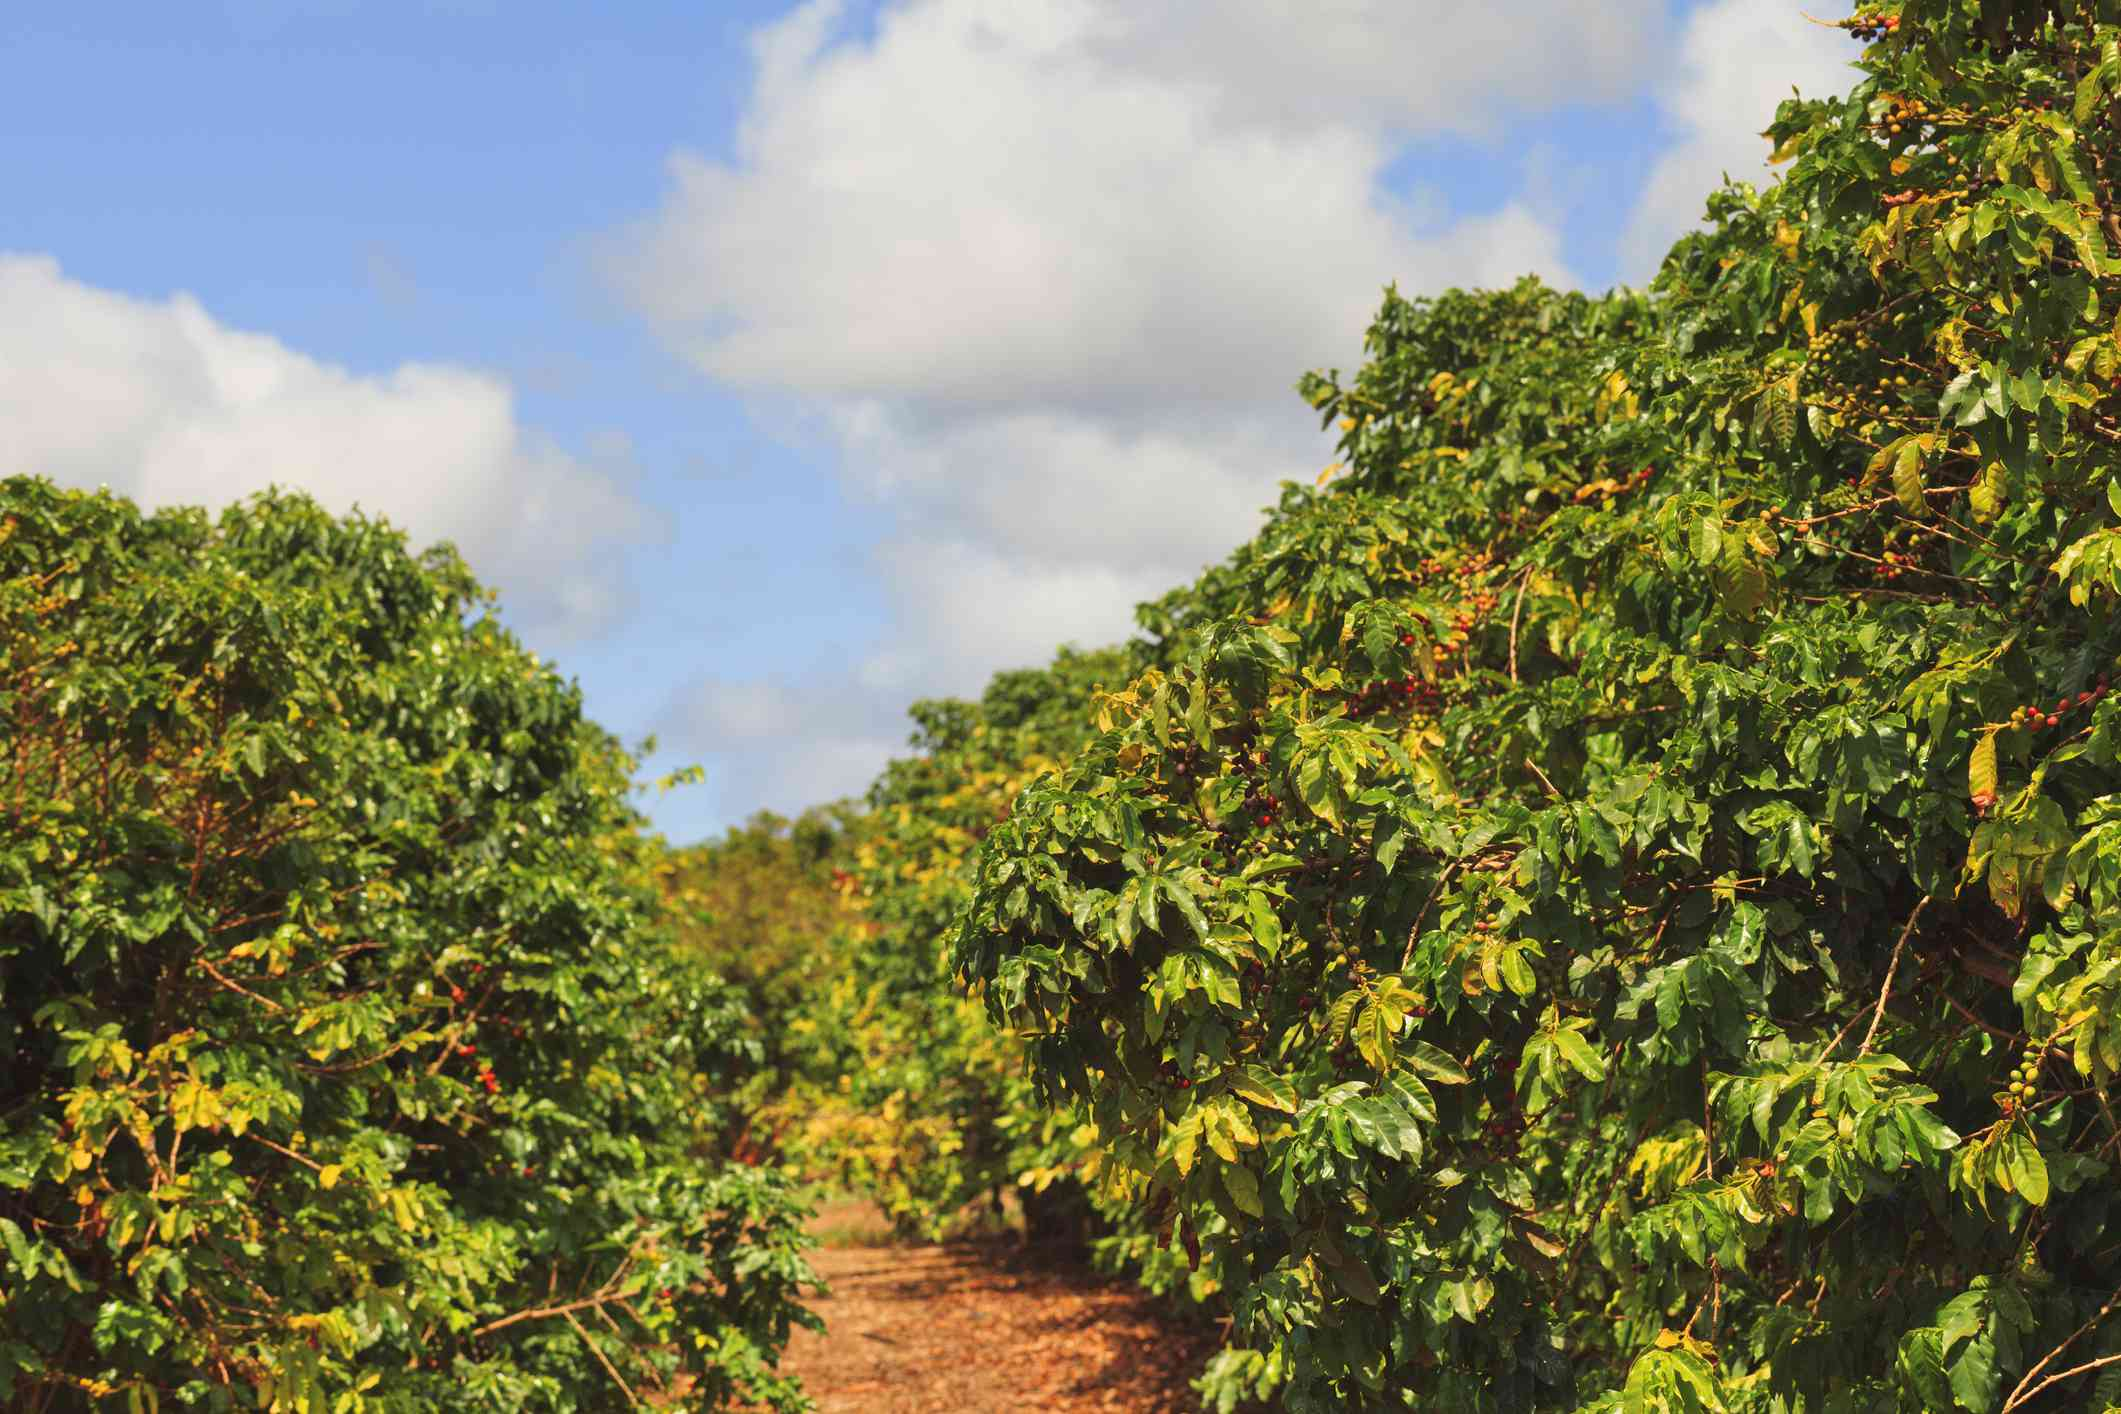 Row of coffee trees in Hawaii